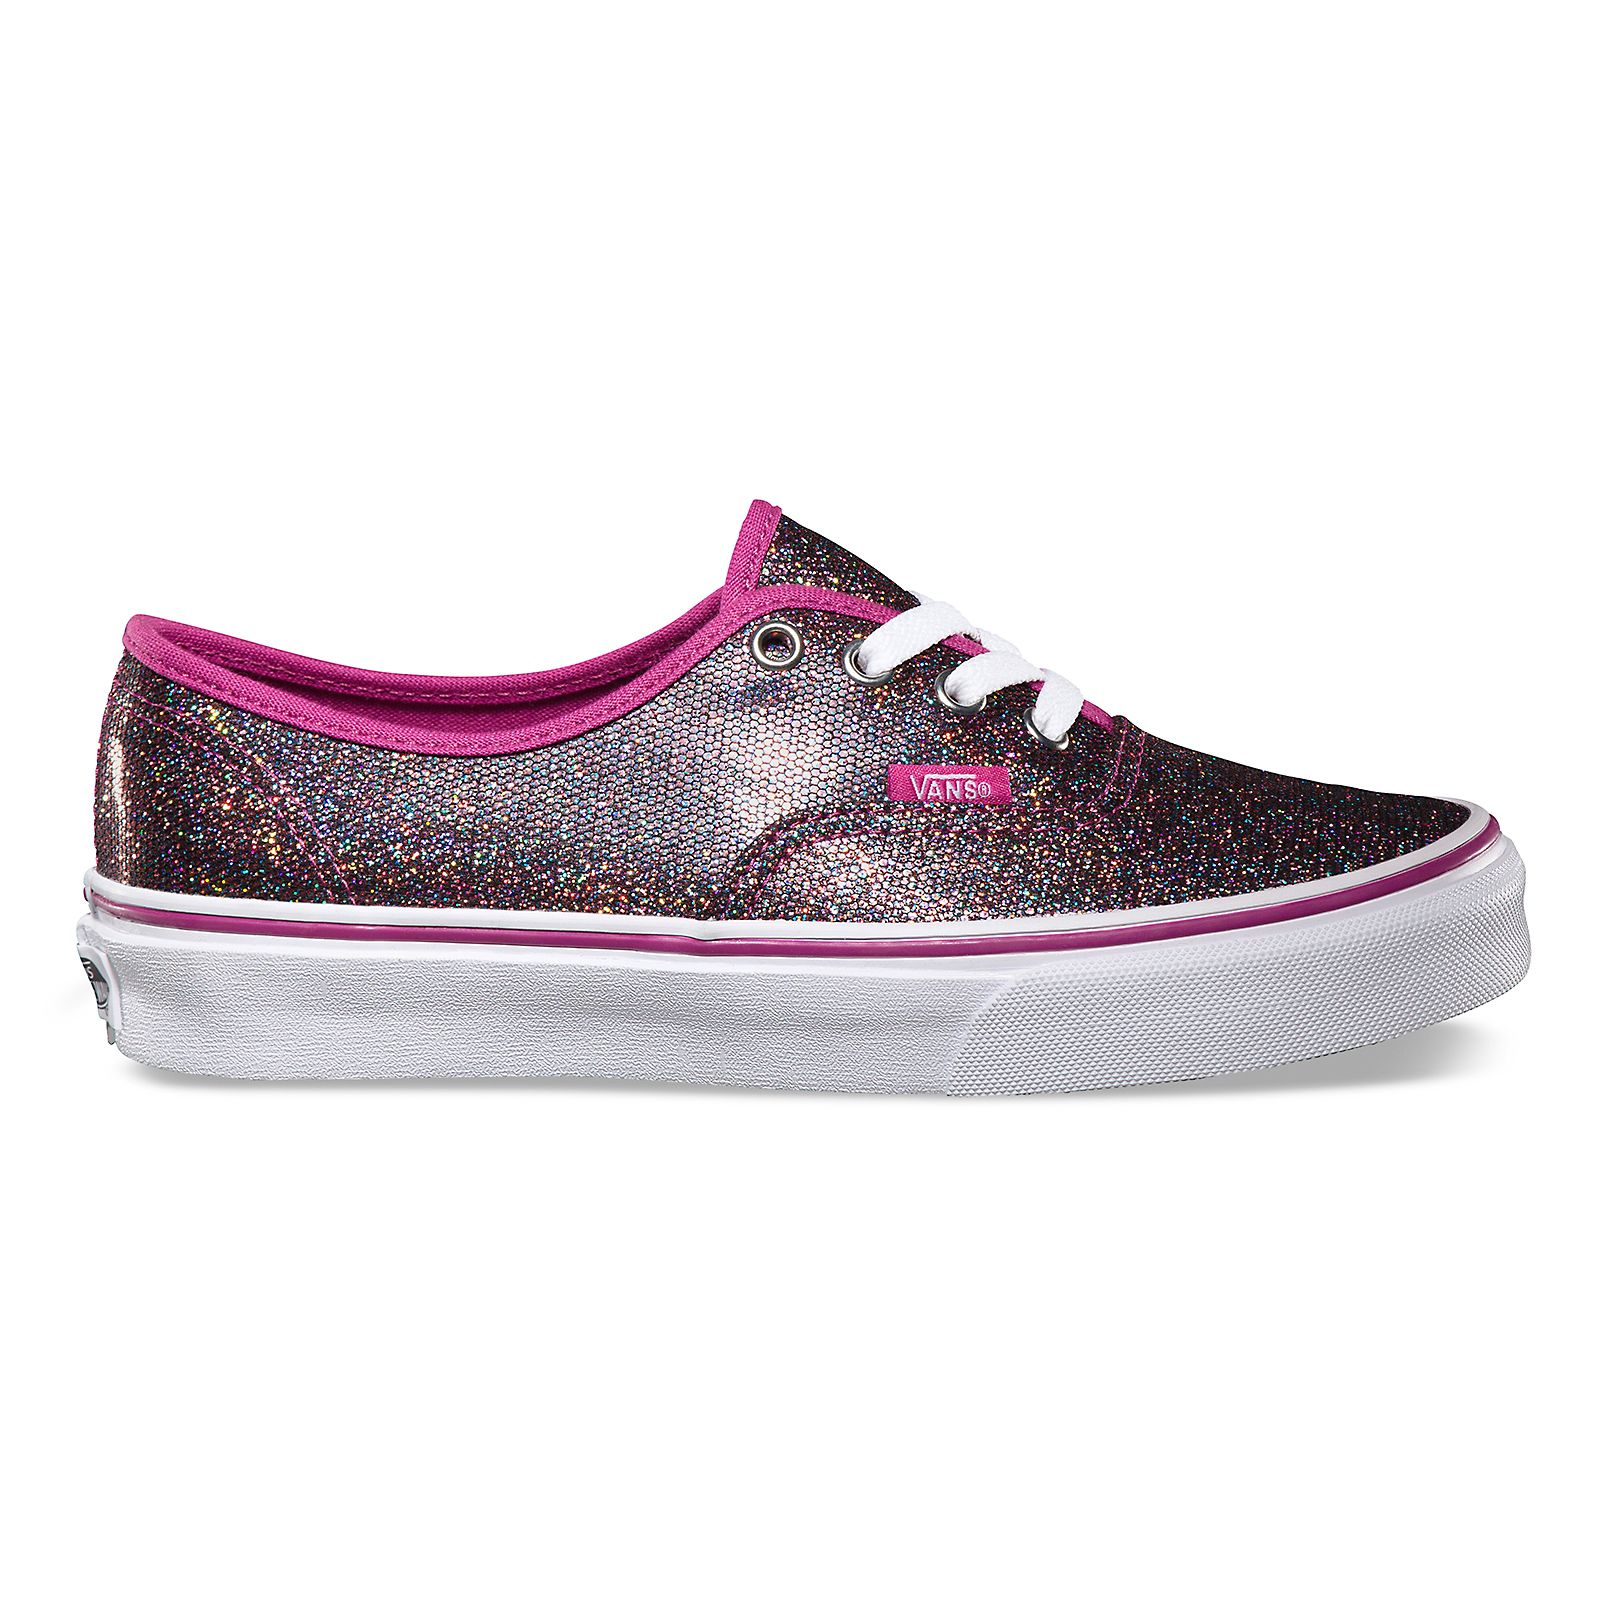 9871e1dd75 Vans Iridescent Glitter Authentic - women s